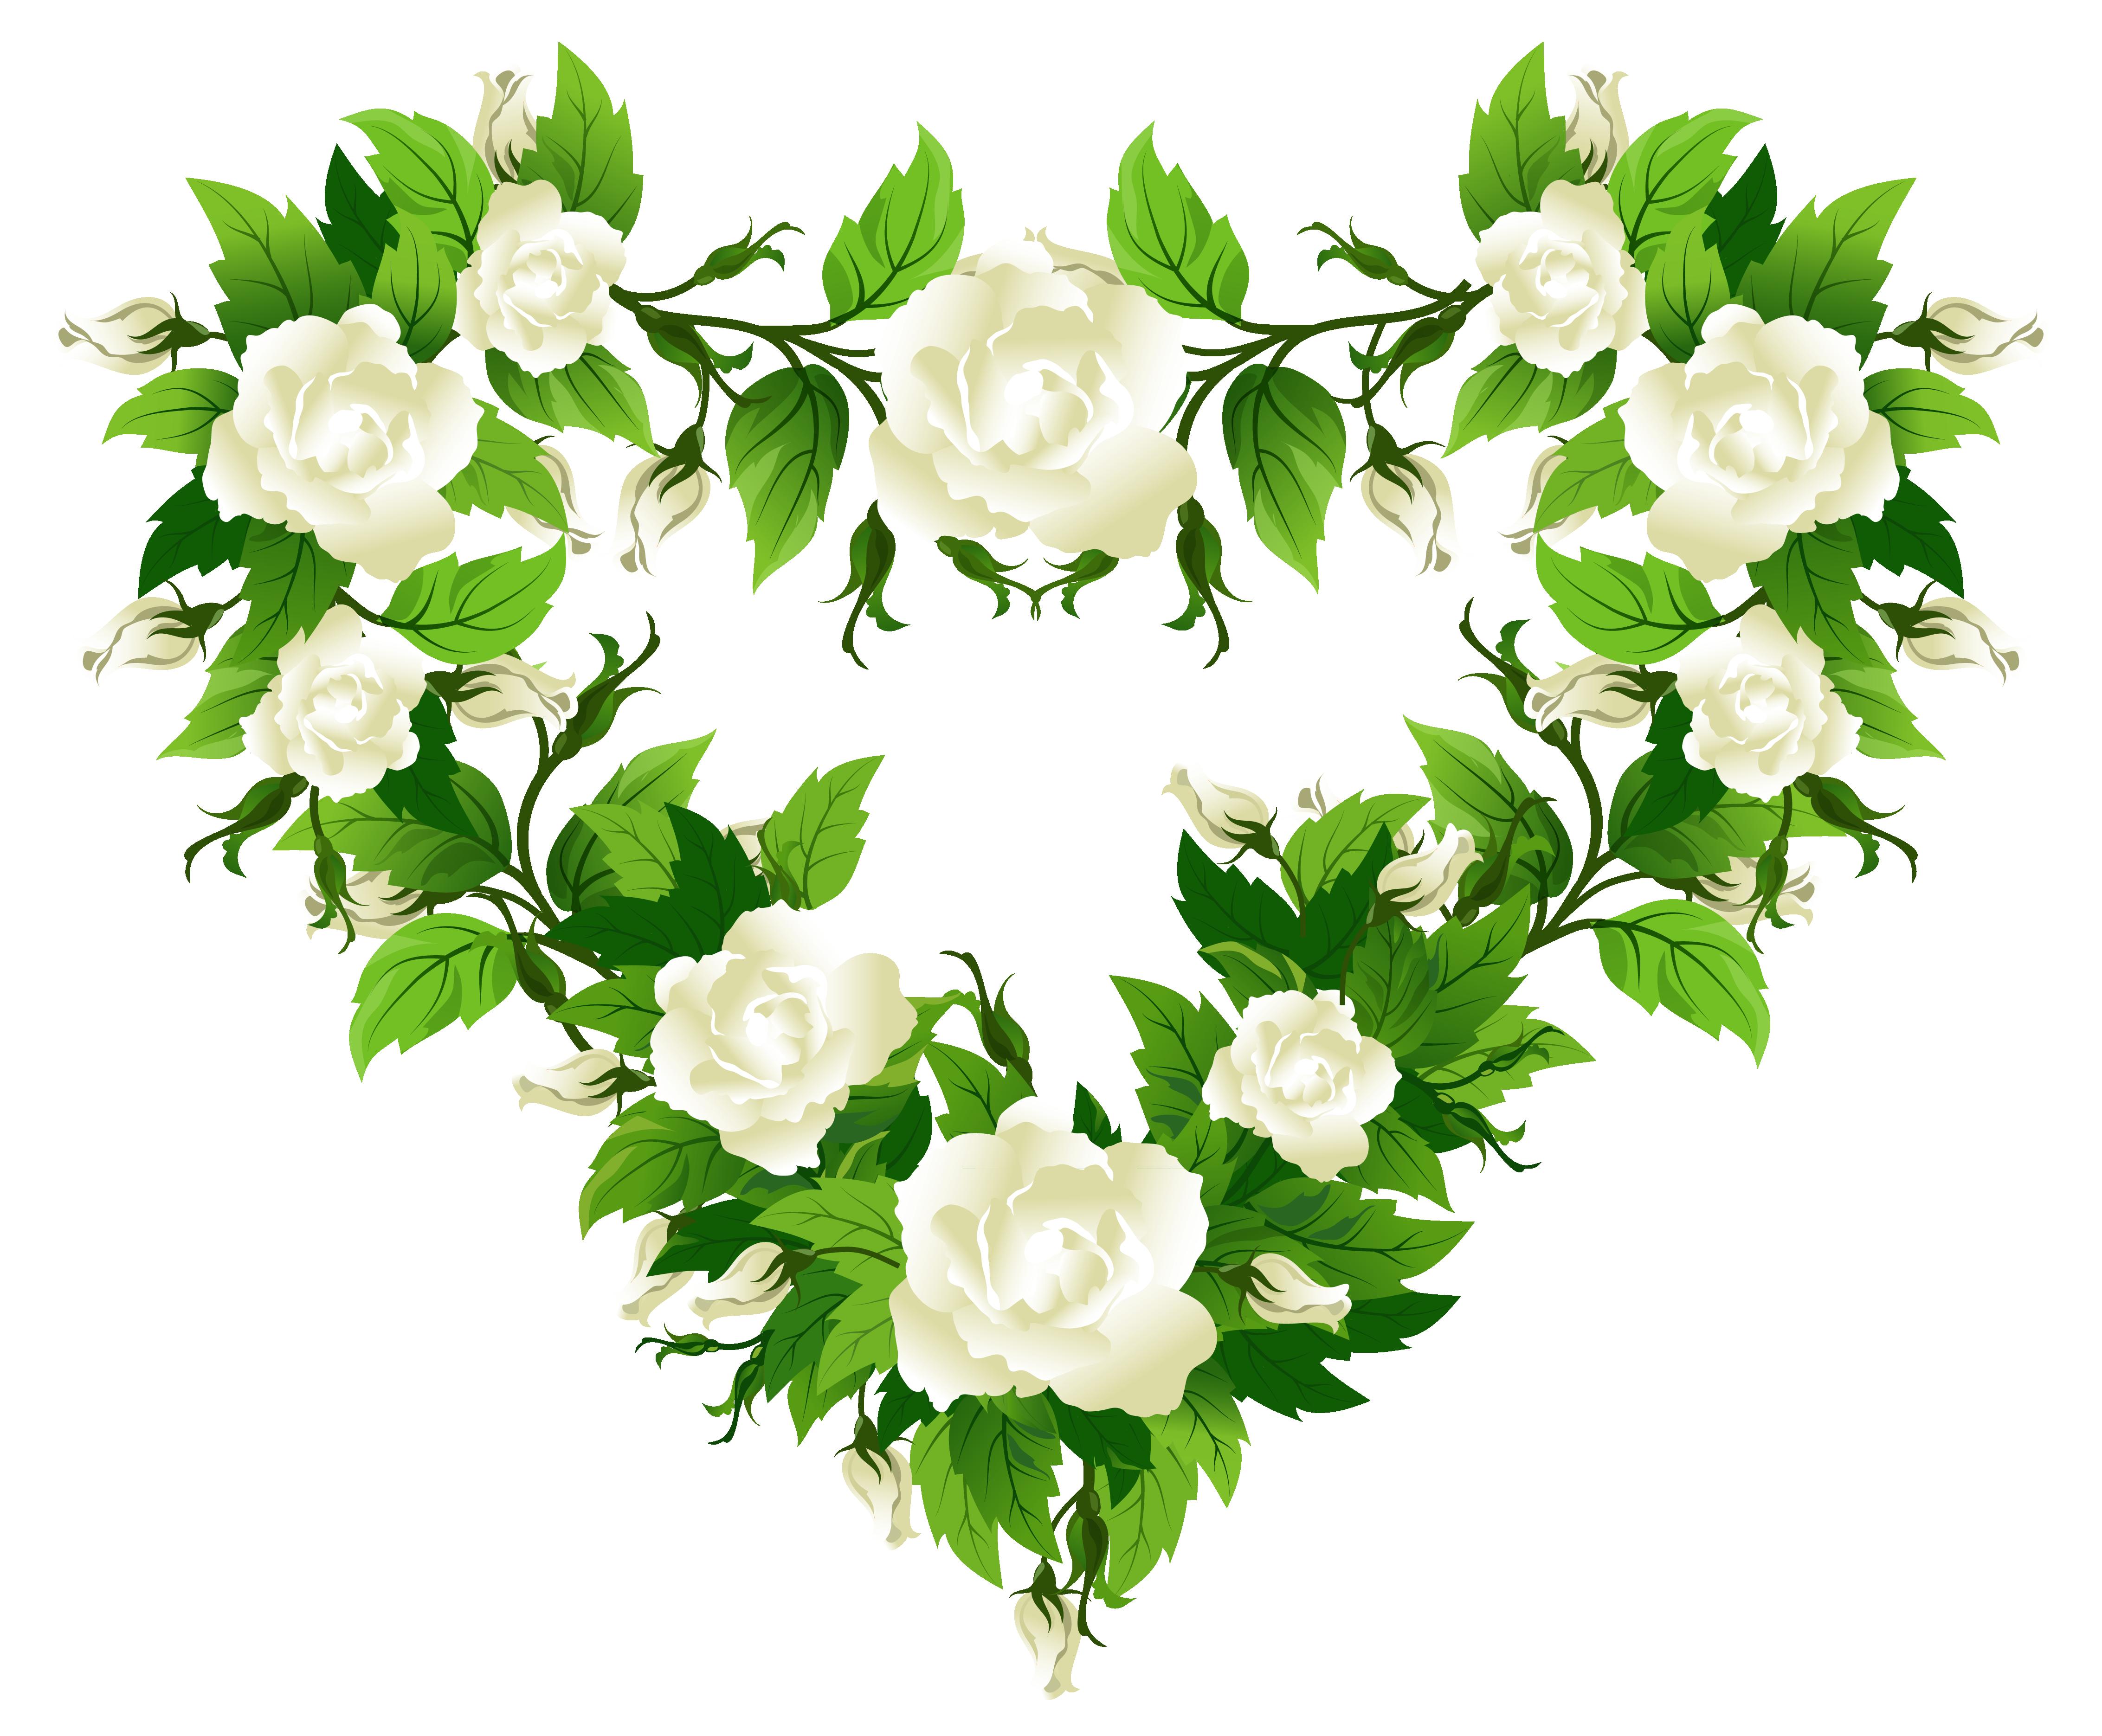 White Rose Flower Transparent Png Free Image By Rawpixel Com Teddy Rawpixel In 2021 White Rose Flower Rose Flower Png Rose Flower